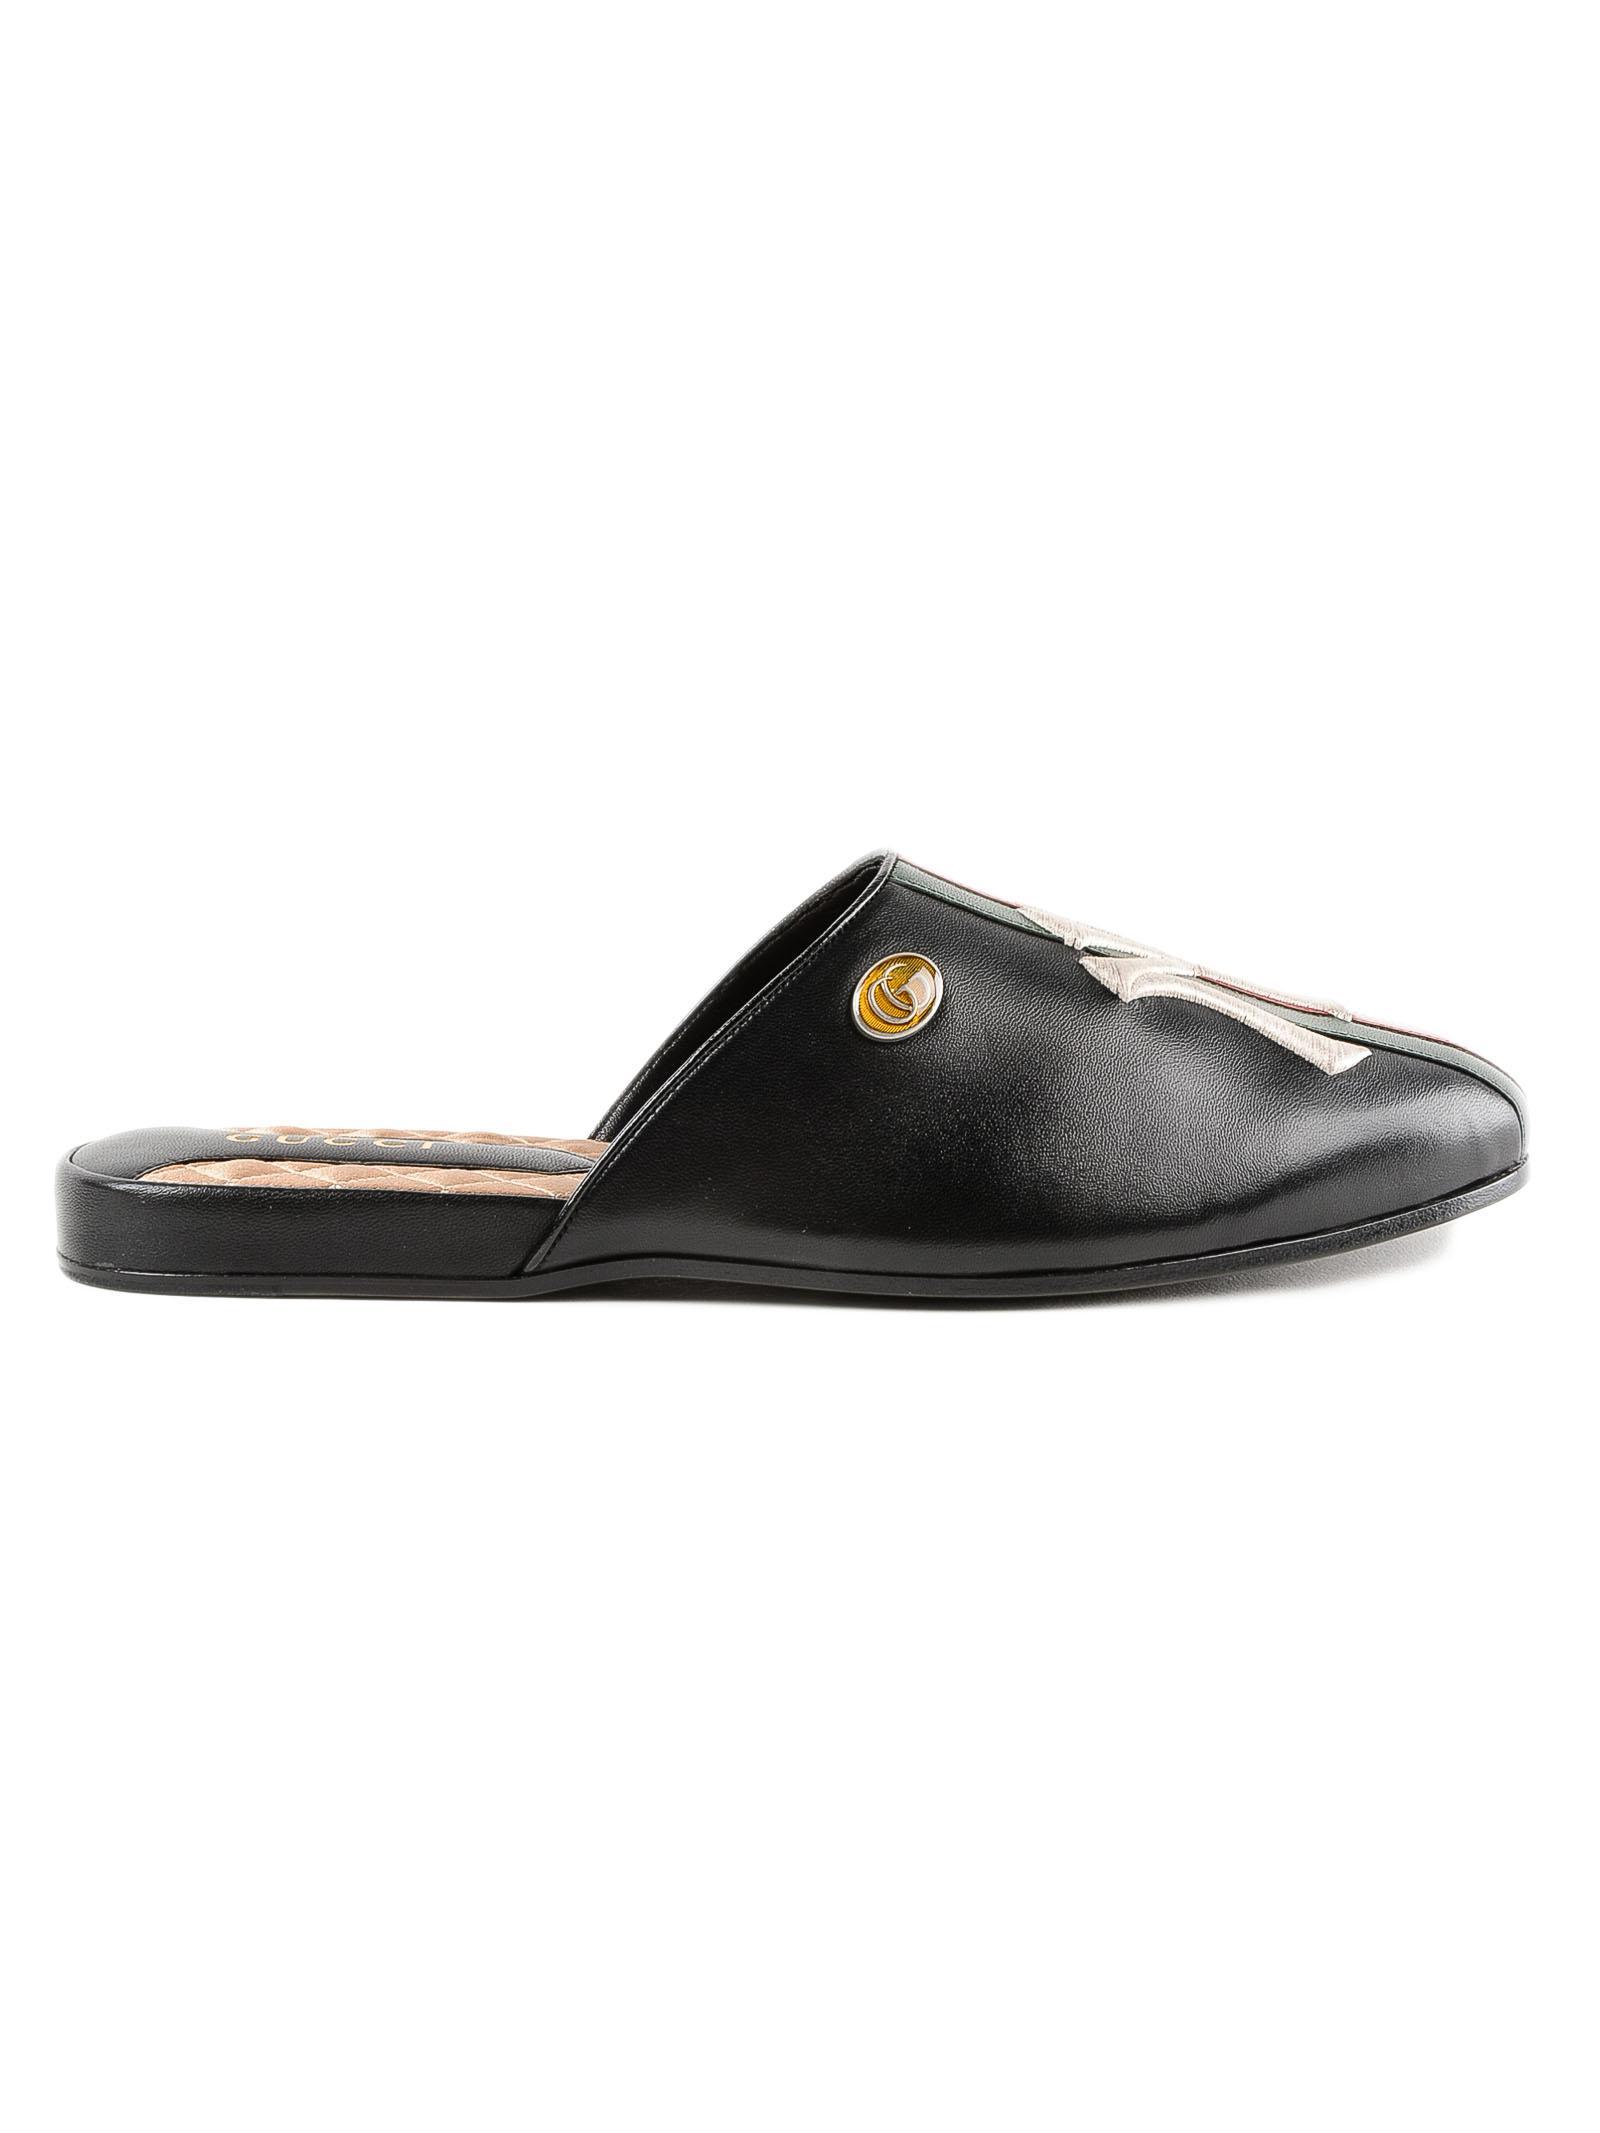 77ecea6de Lyst - Gucci Quentin Plonge` in Black for Men